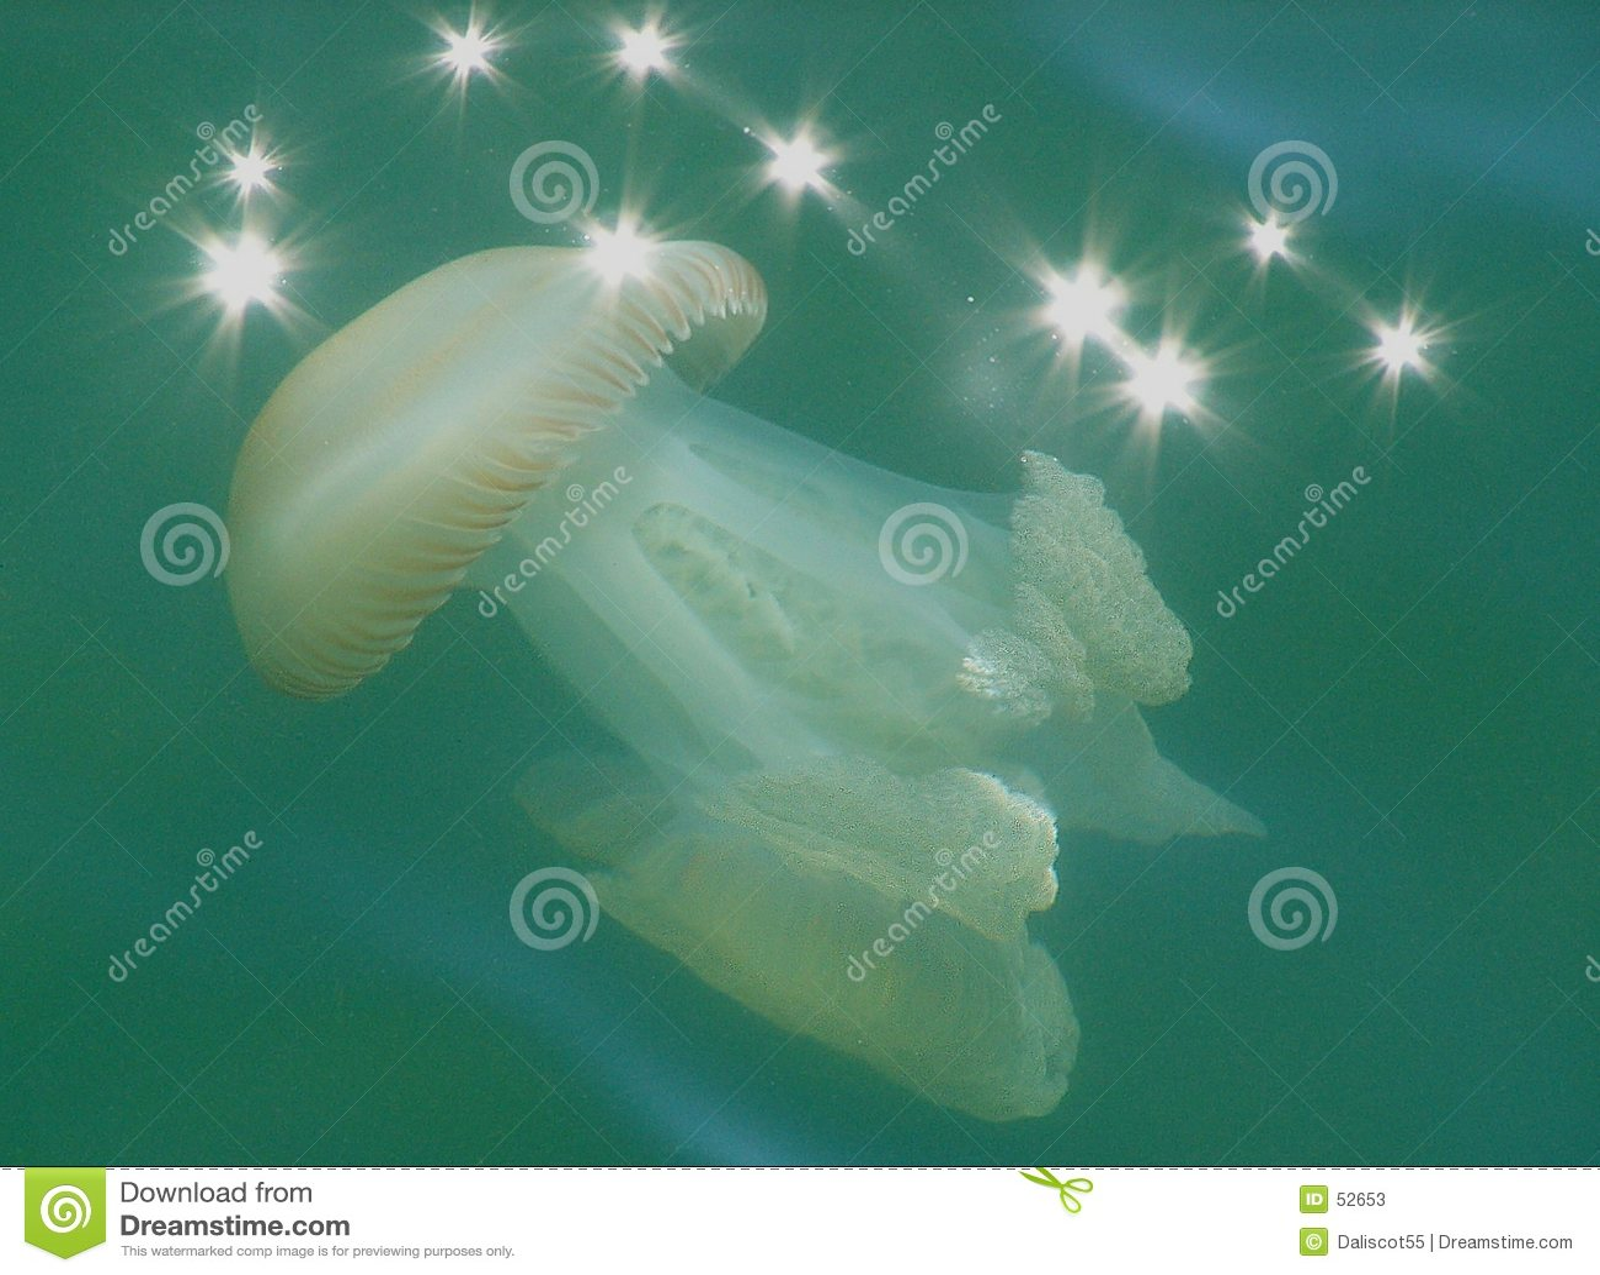 Meduse Starlit